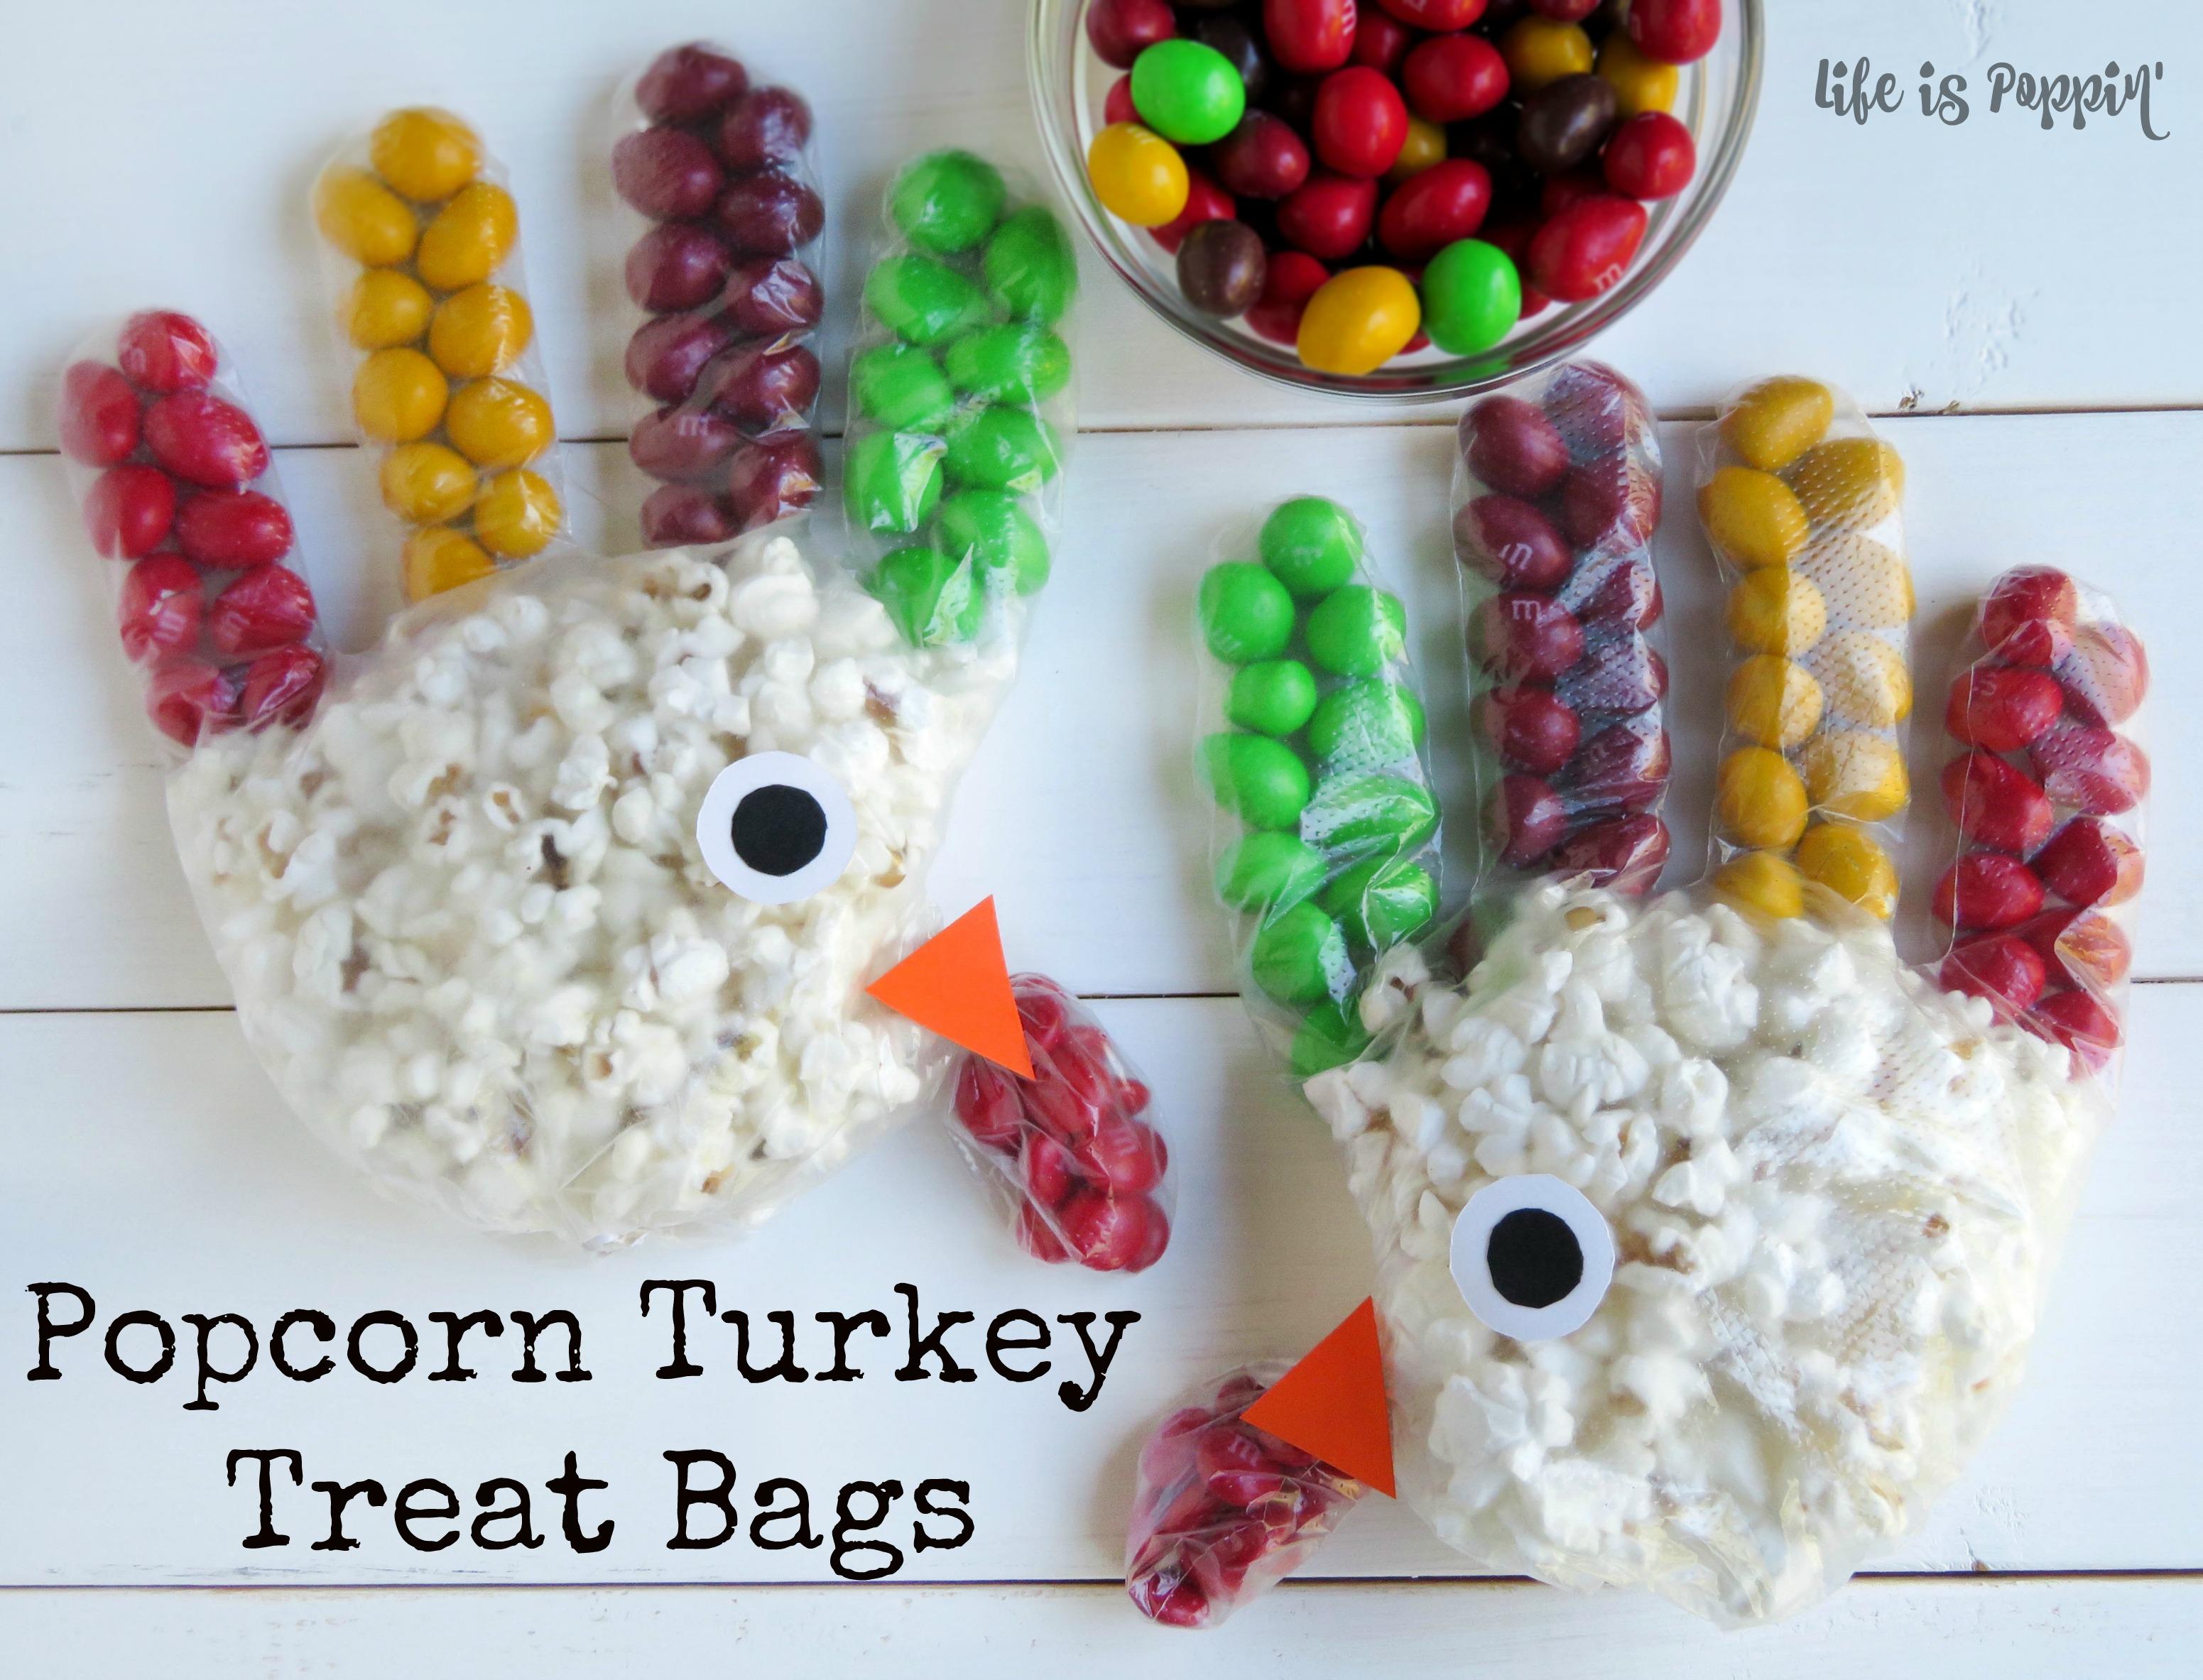 popcorn turkey treat bags is poppin